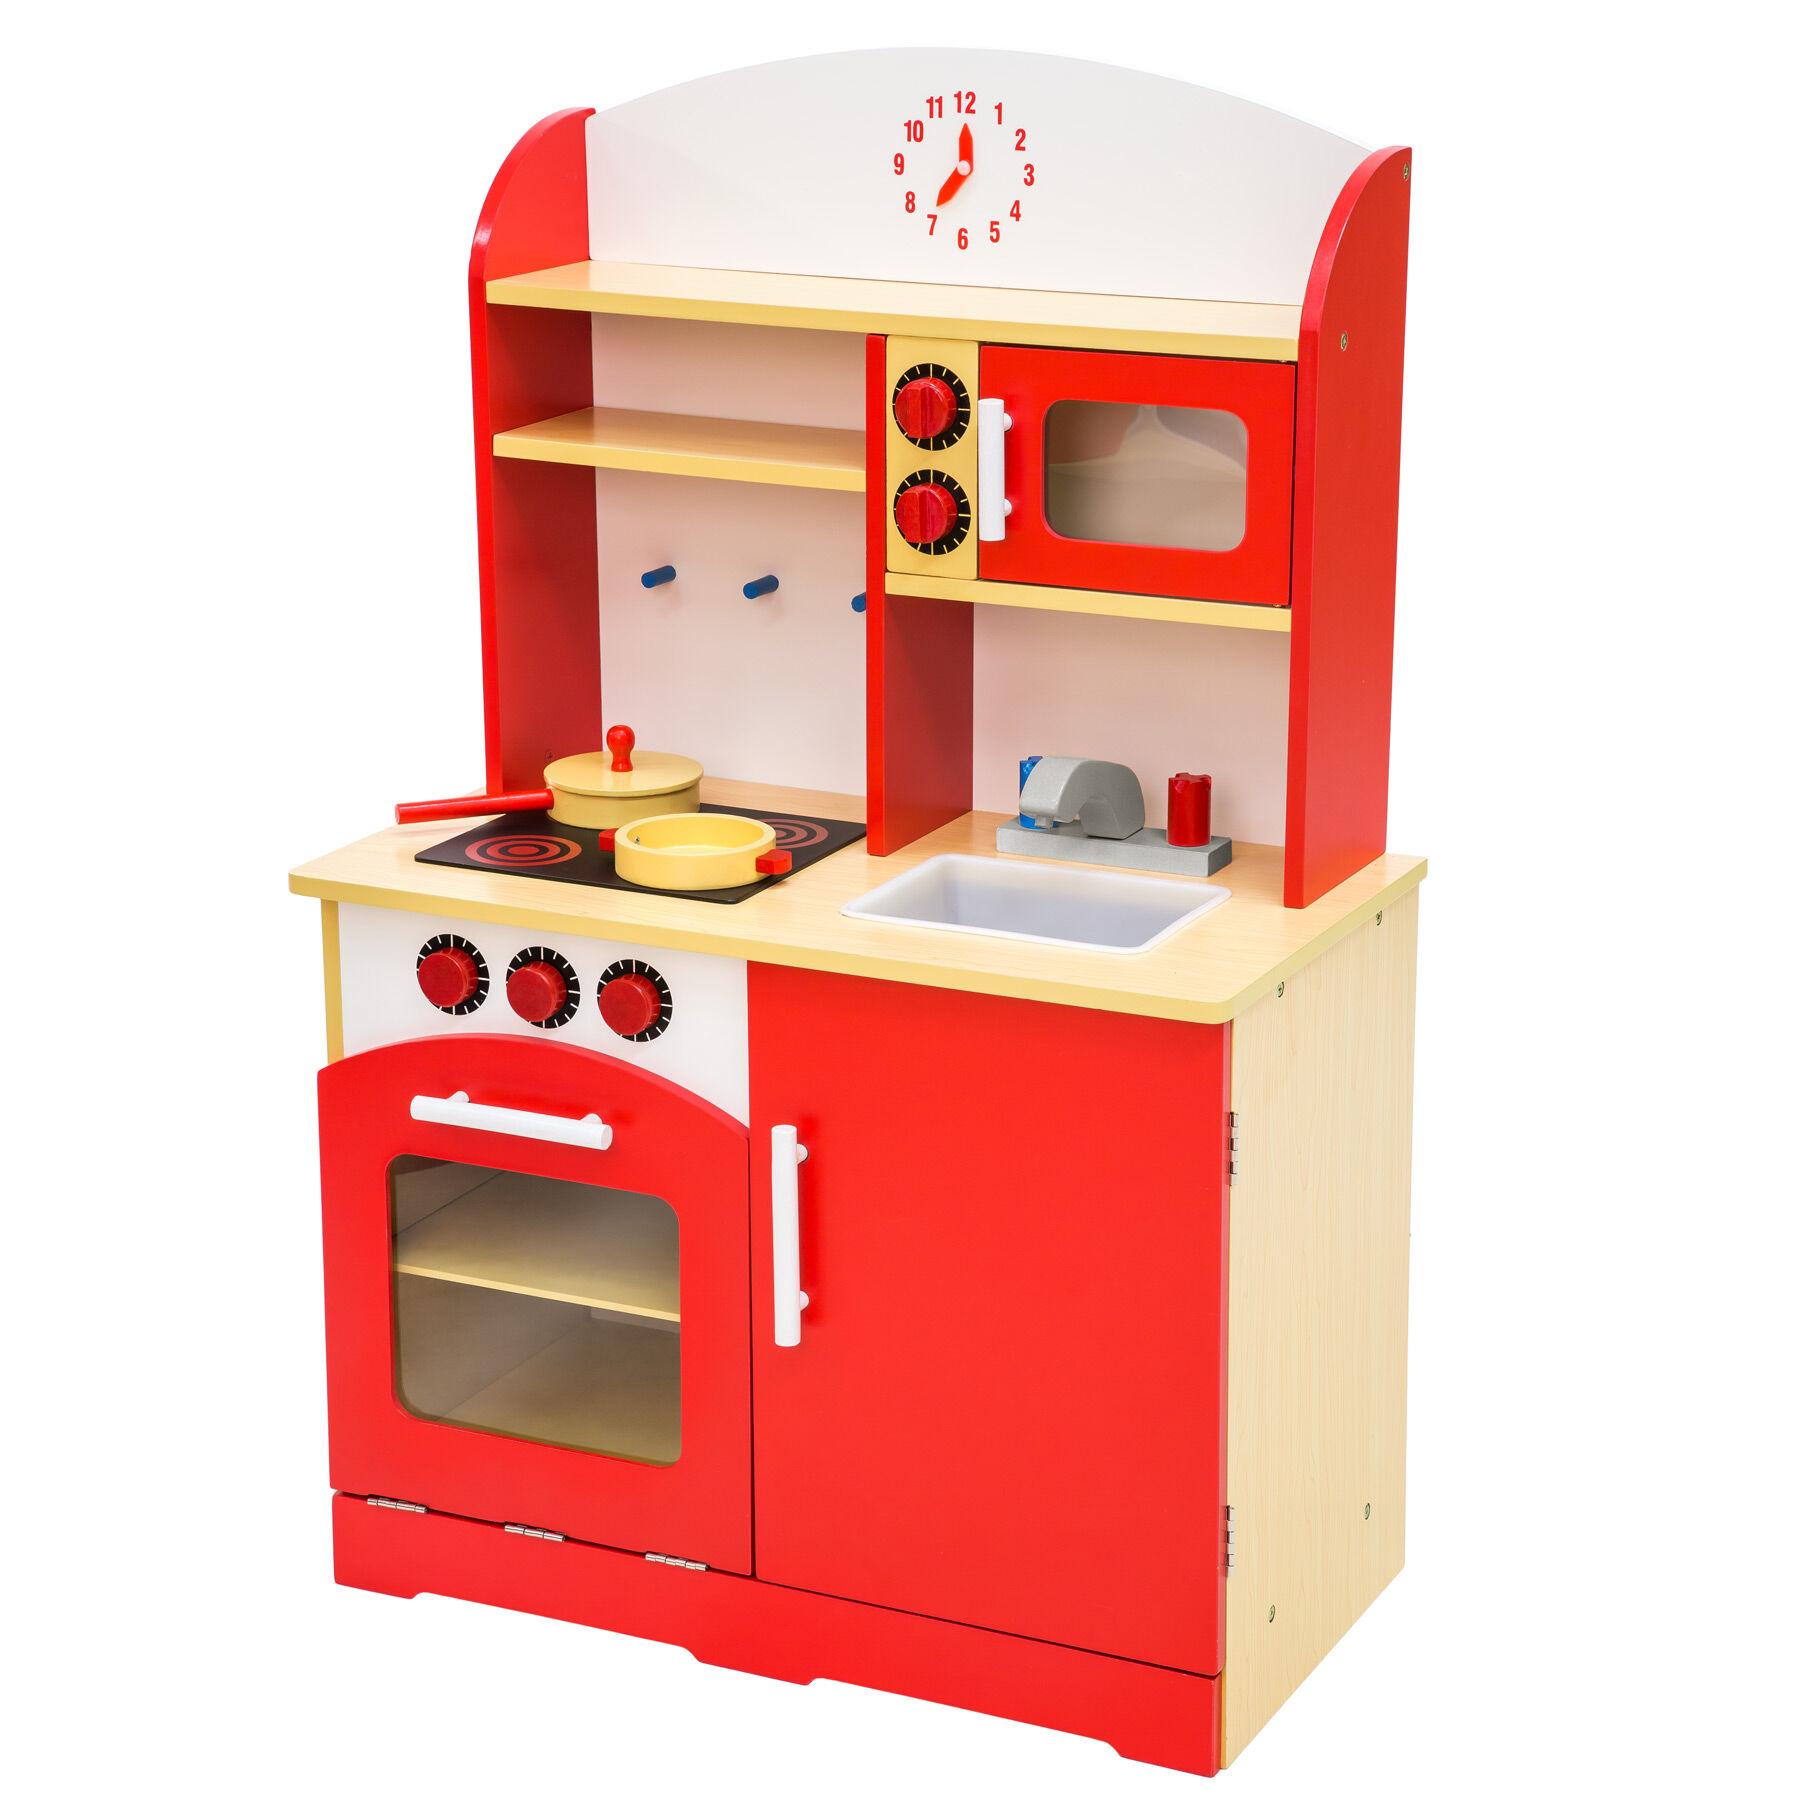 tectake Toy kitchen - red